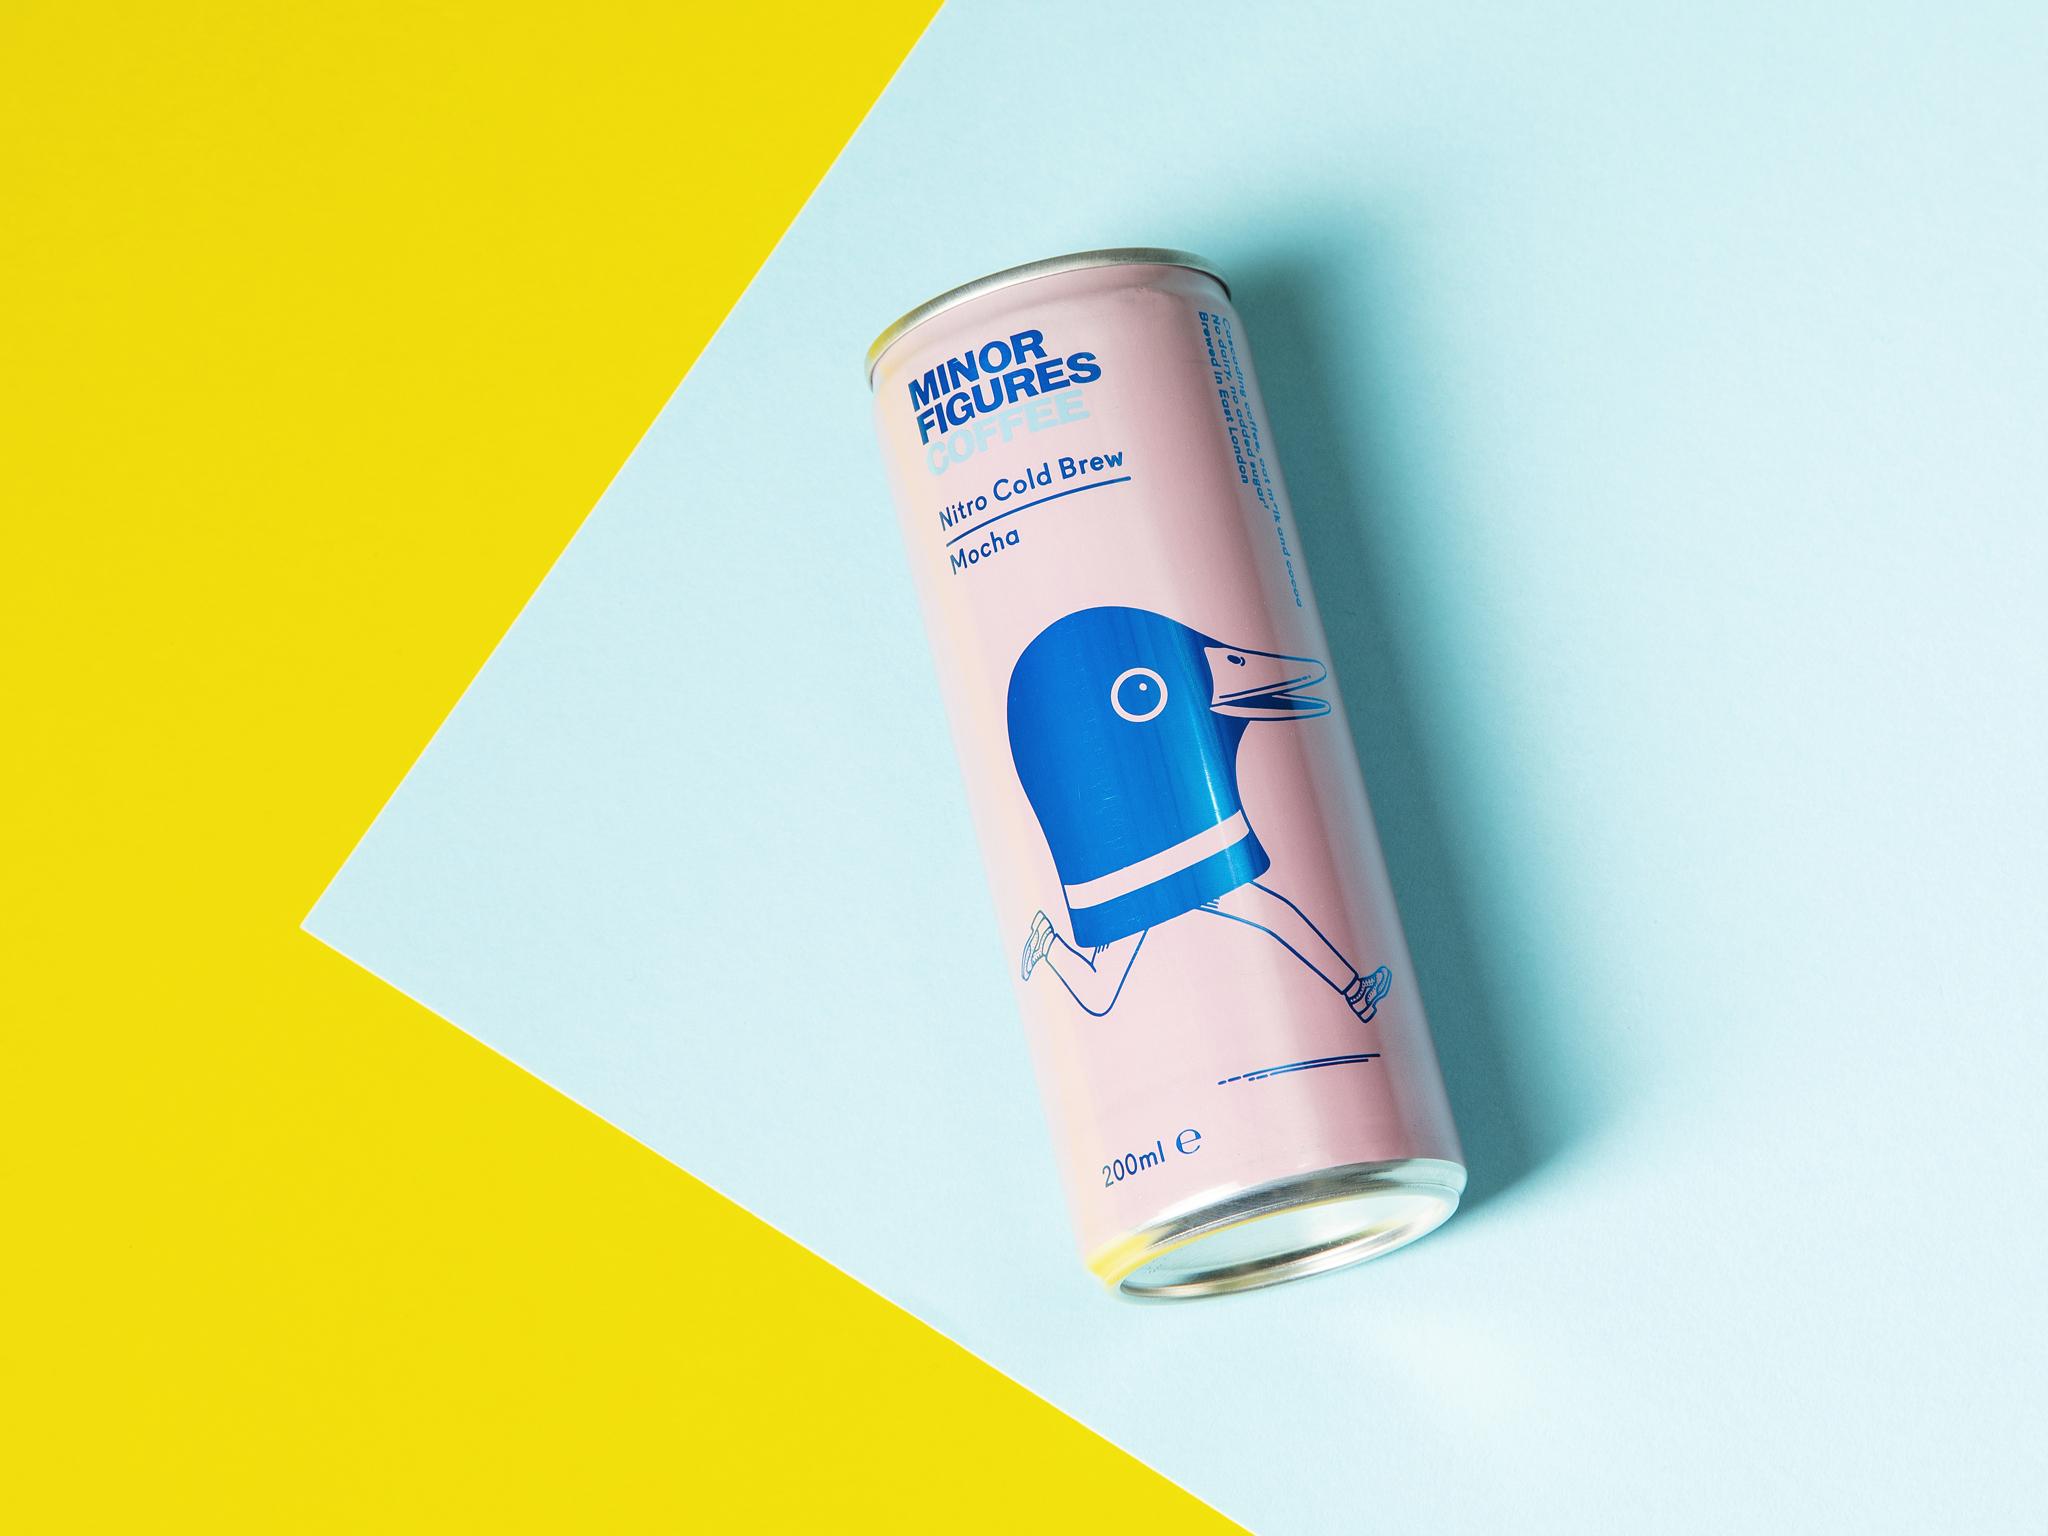 minor figures, nitro cold brew mocha, london's best tinnies